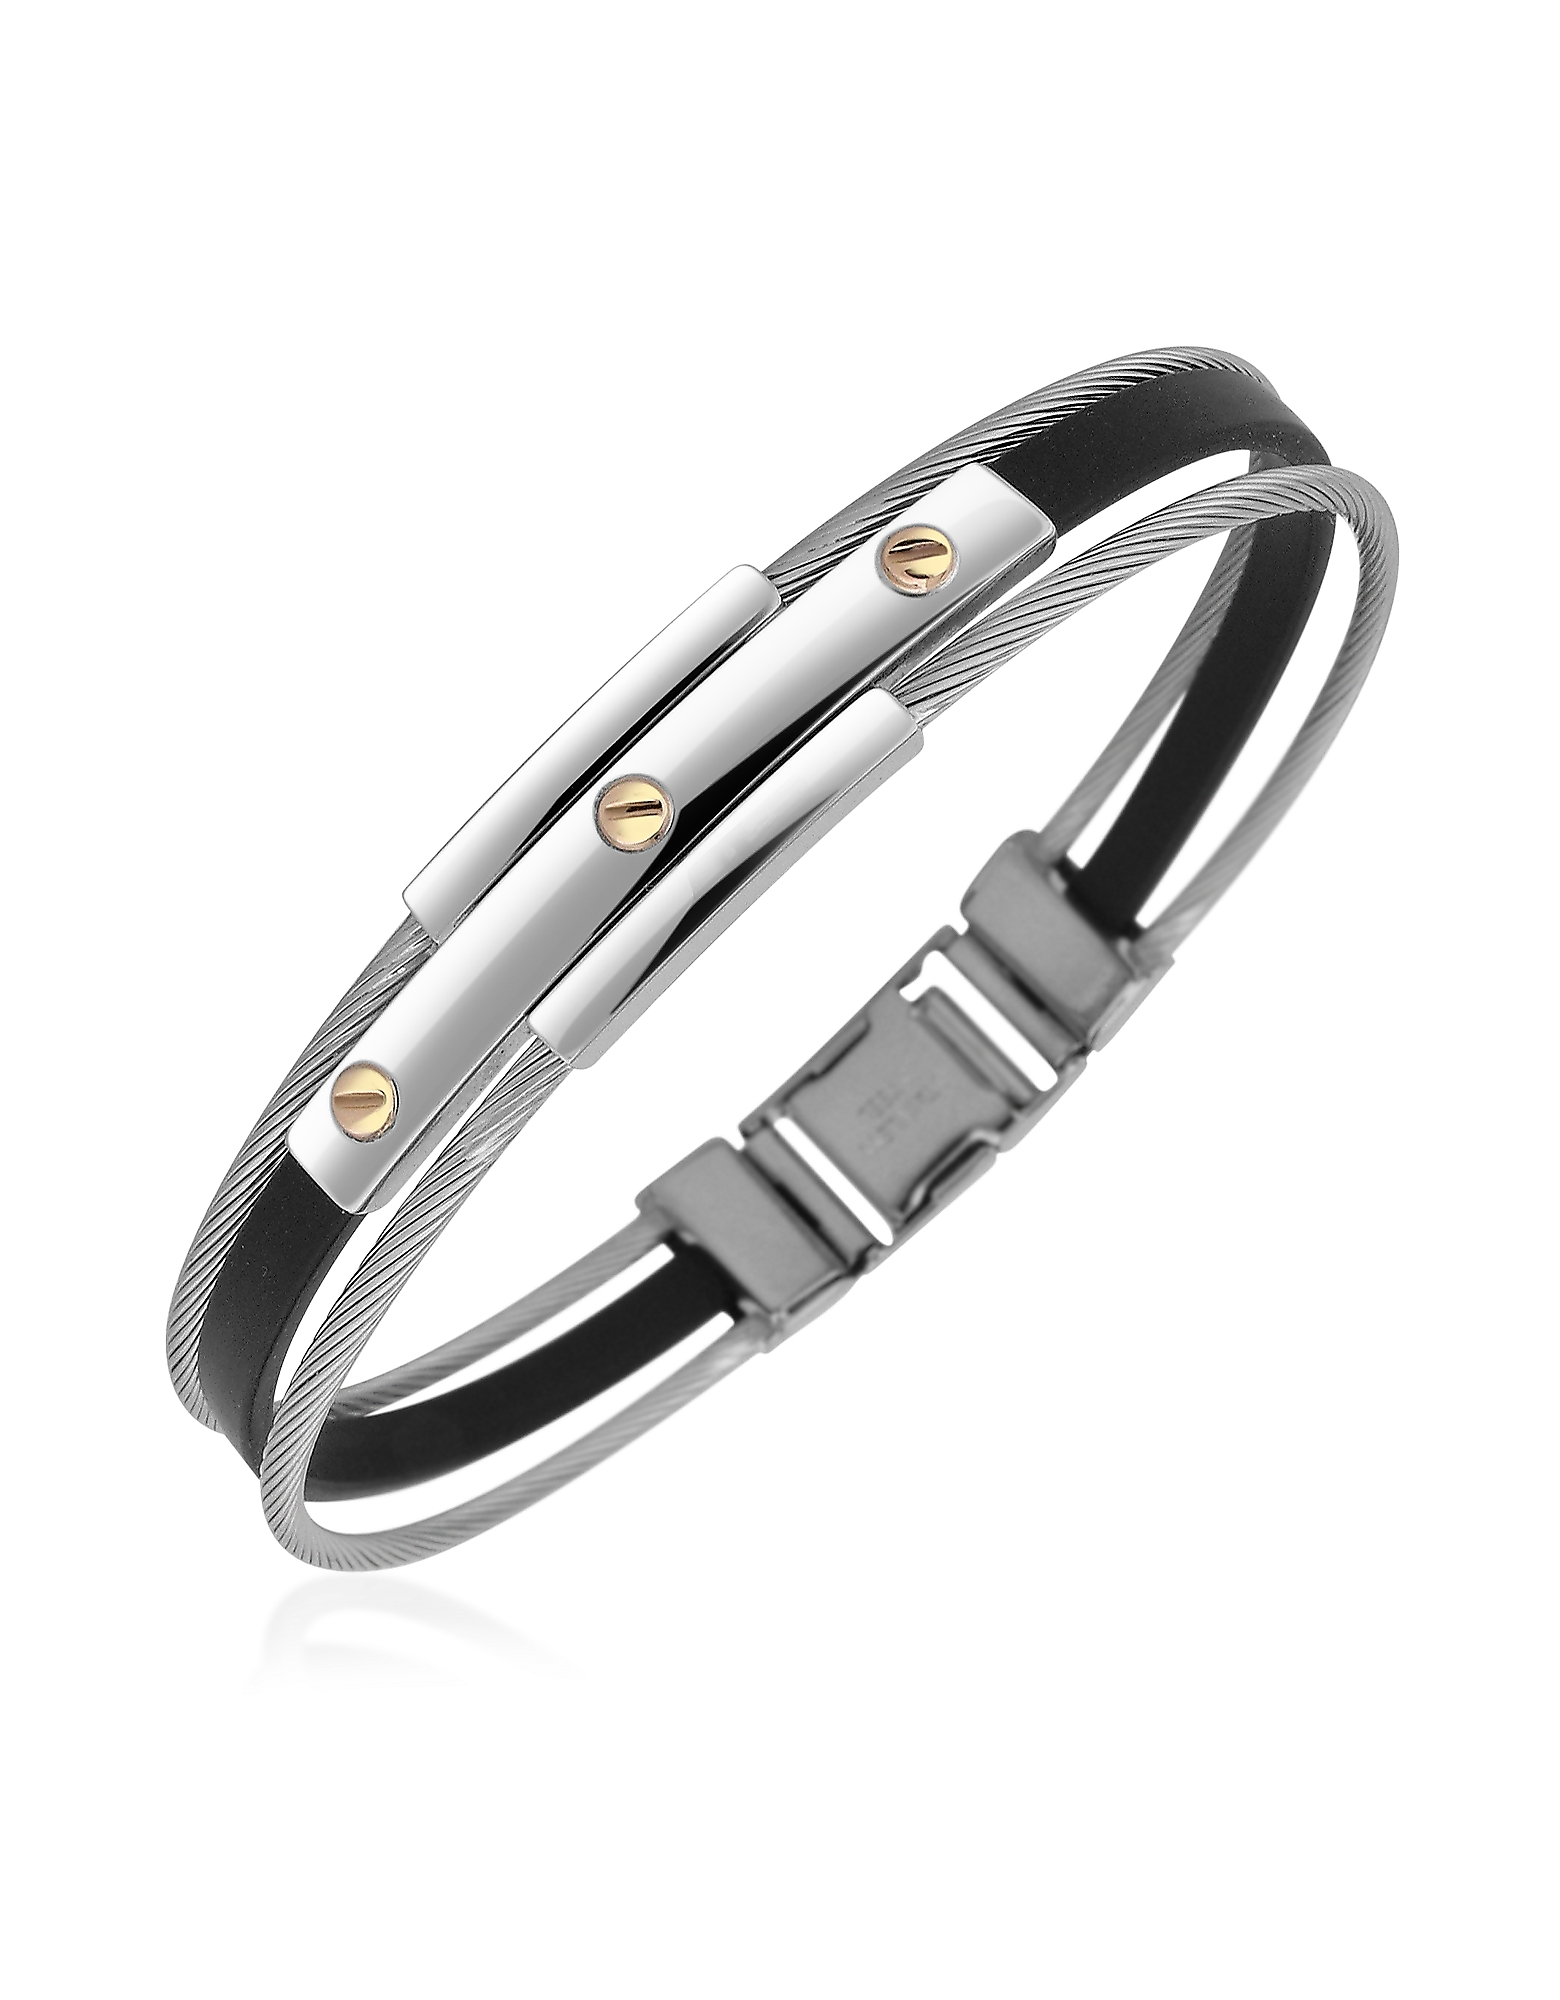 Men's Stainless Steel and Rubber Screws Bracelet